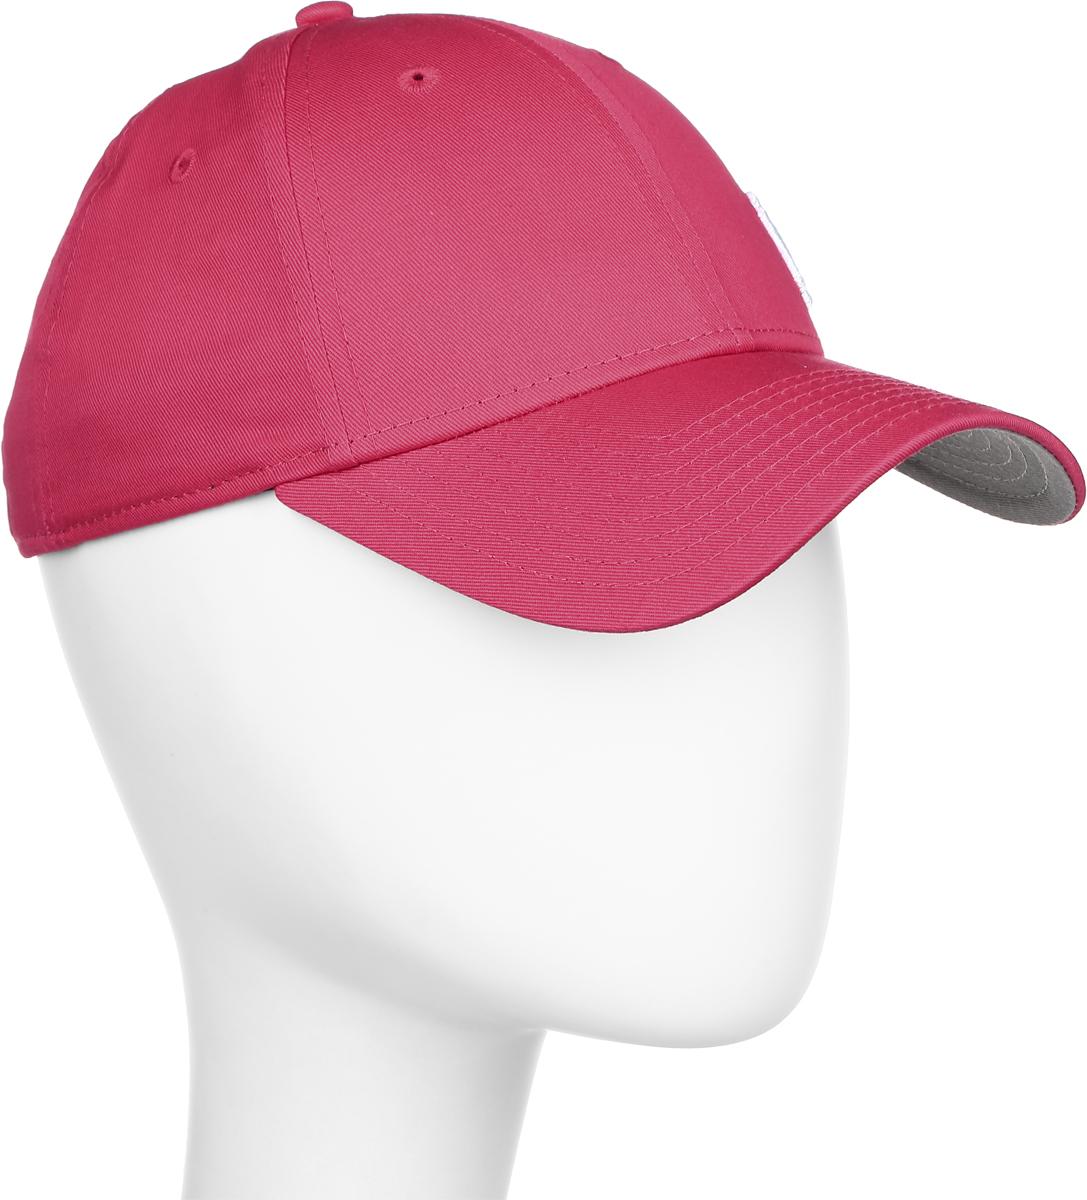 Бейсболка New Era Flawless New York Yankees, цвет: розовый. 11227303-PNK. Размер универсальный